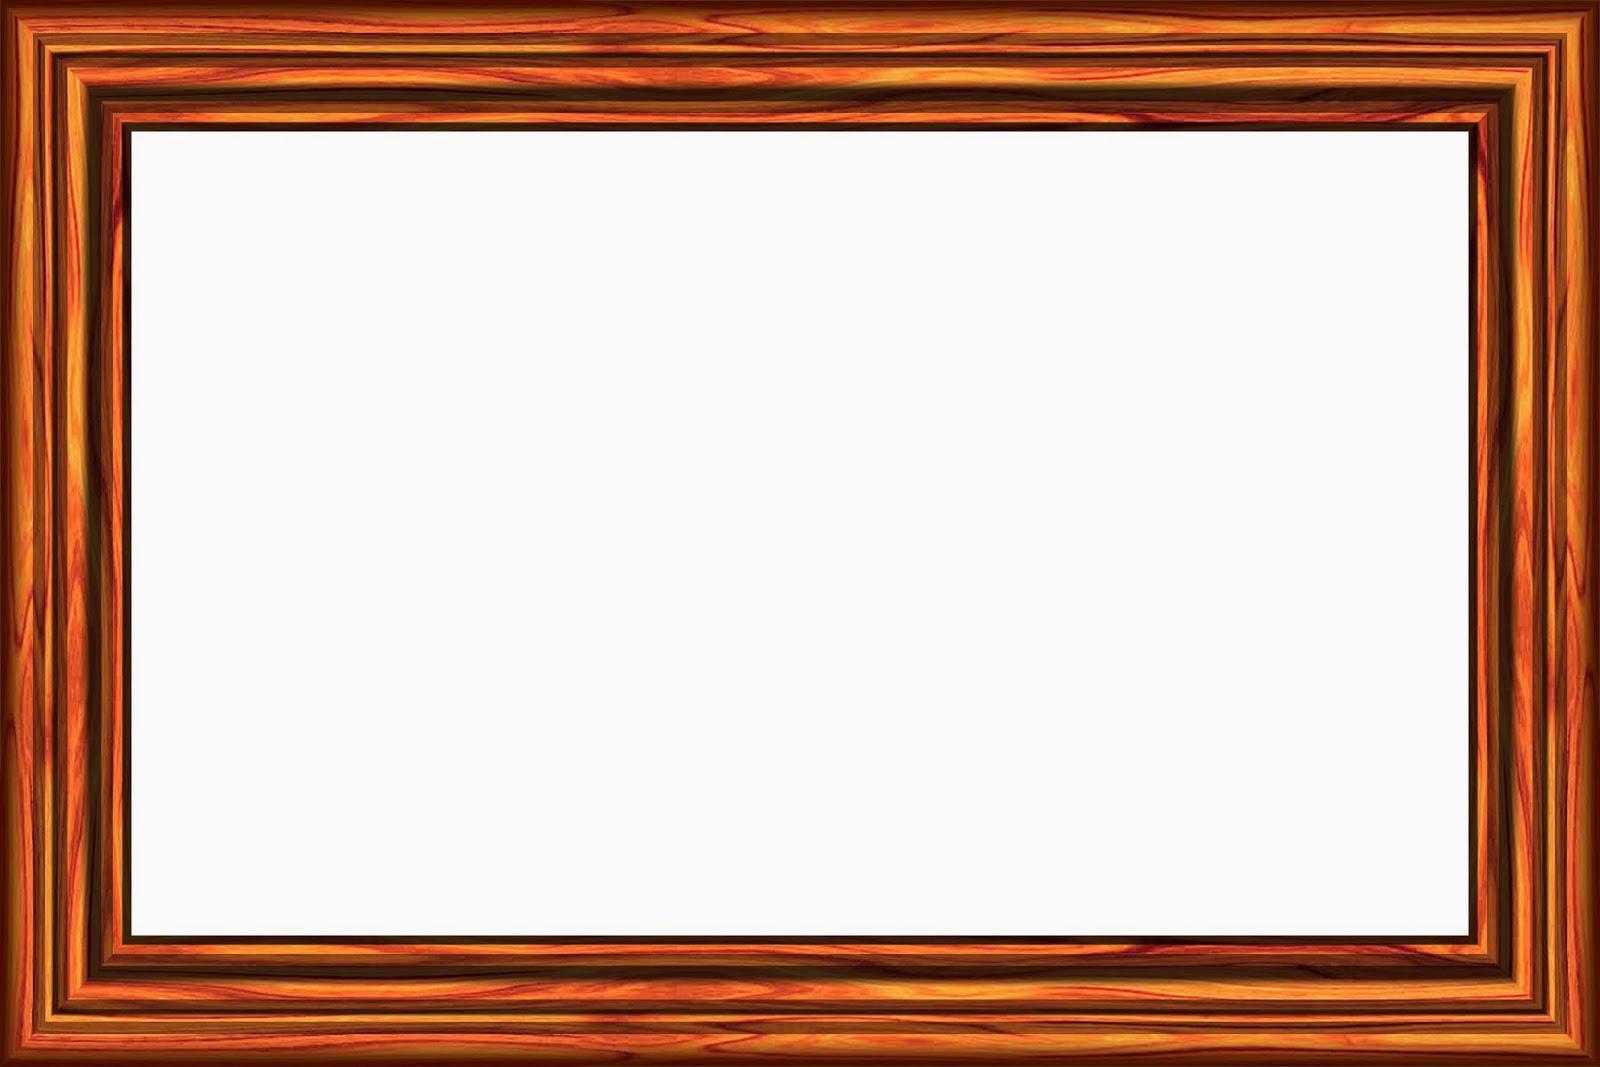 wooden frame rough fiber metallic wooden frame rough wooden frame